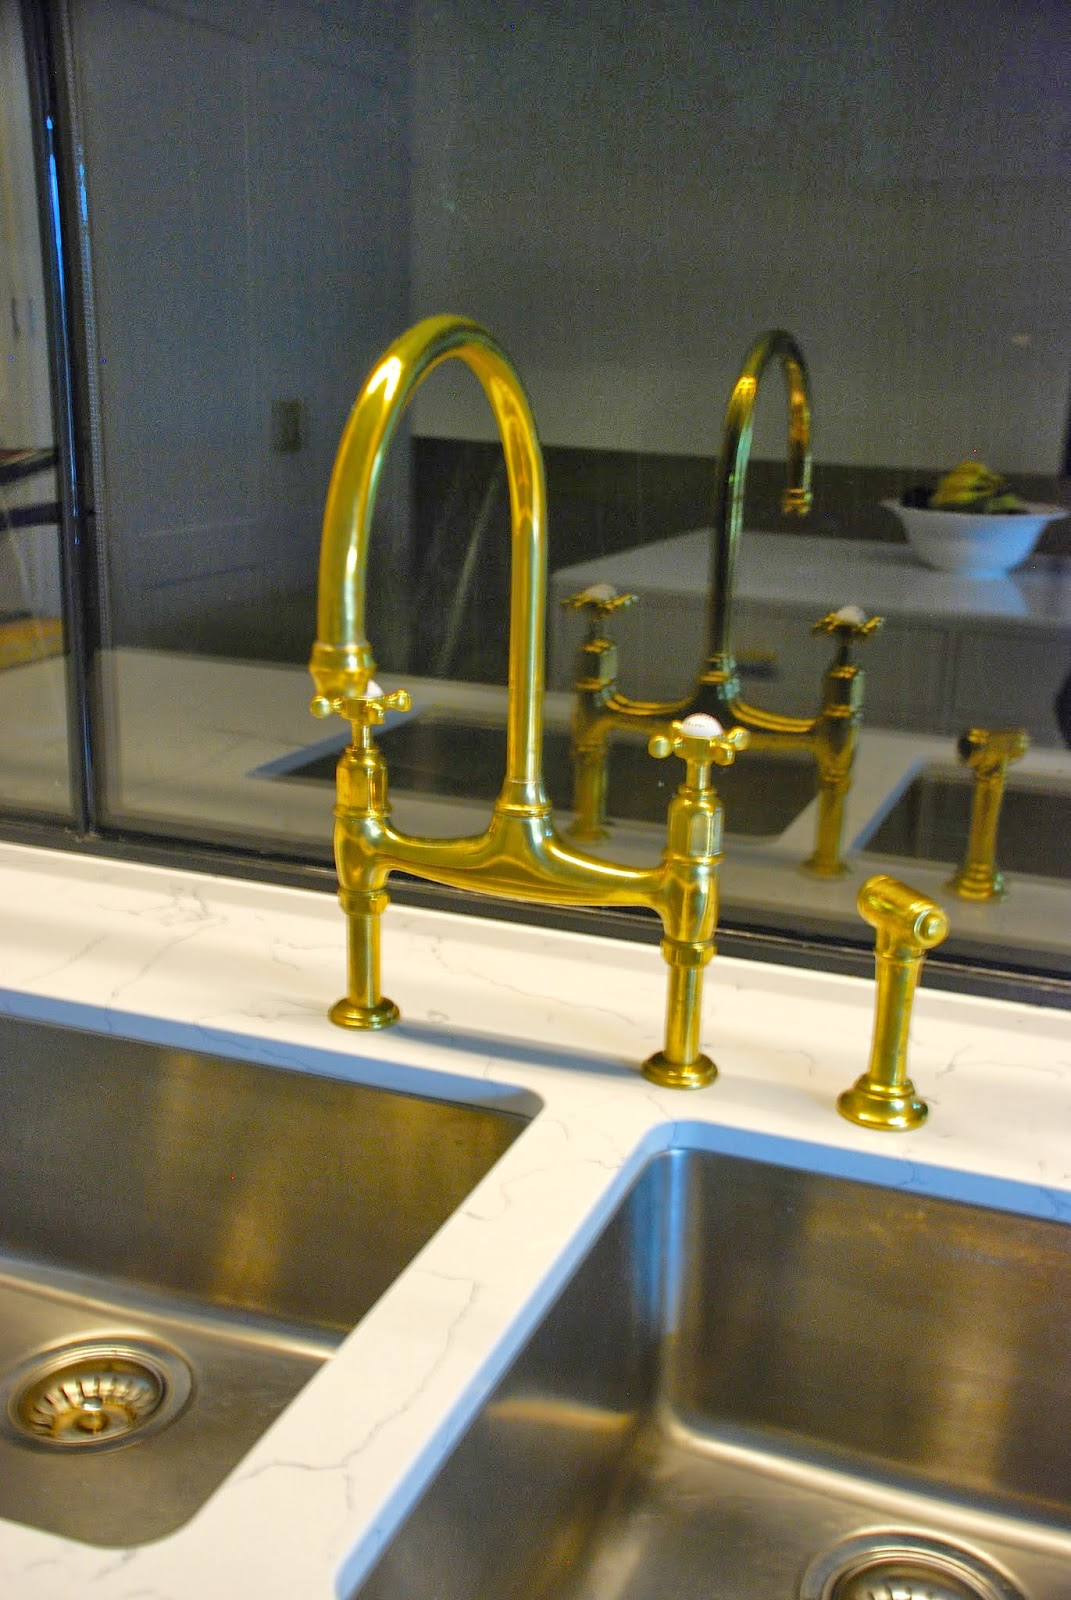 Uncategorized Kitchen Appliances Adelaide adelaide villa the kitchen appliance review siemens neff perrin rowe electrolux franke qasair